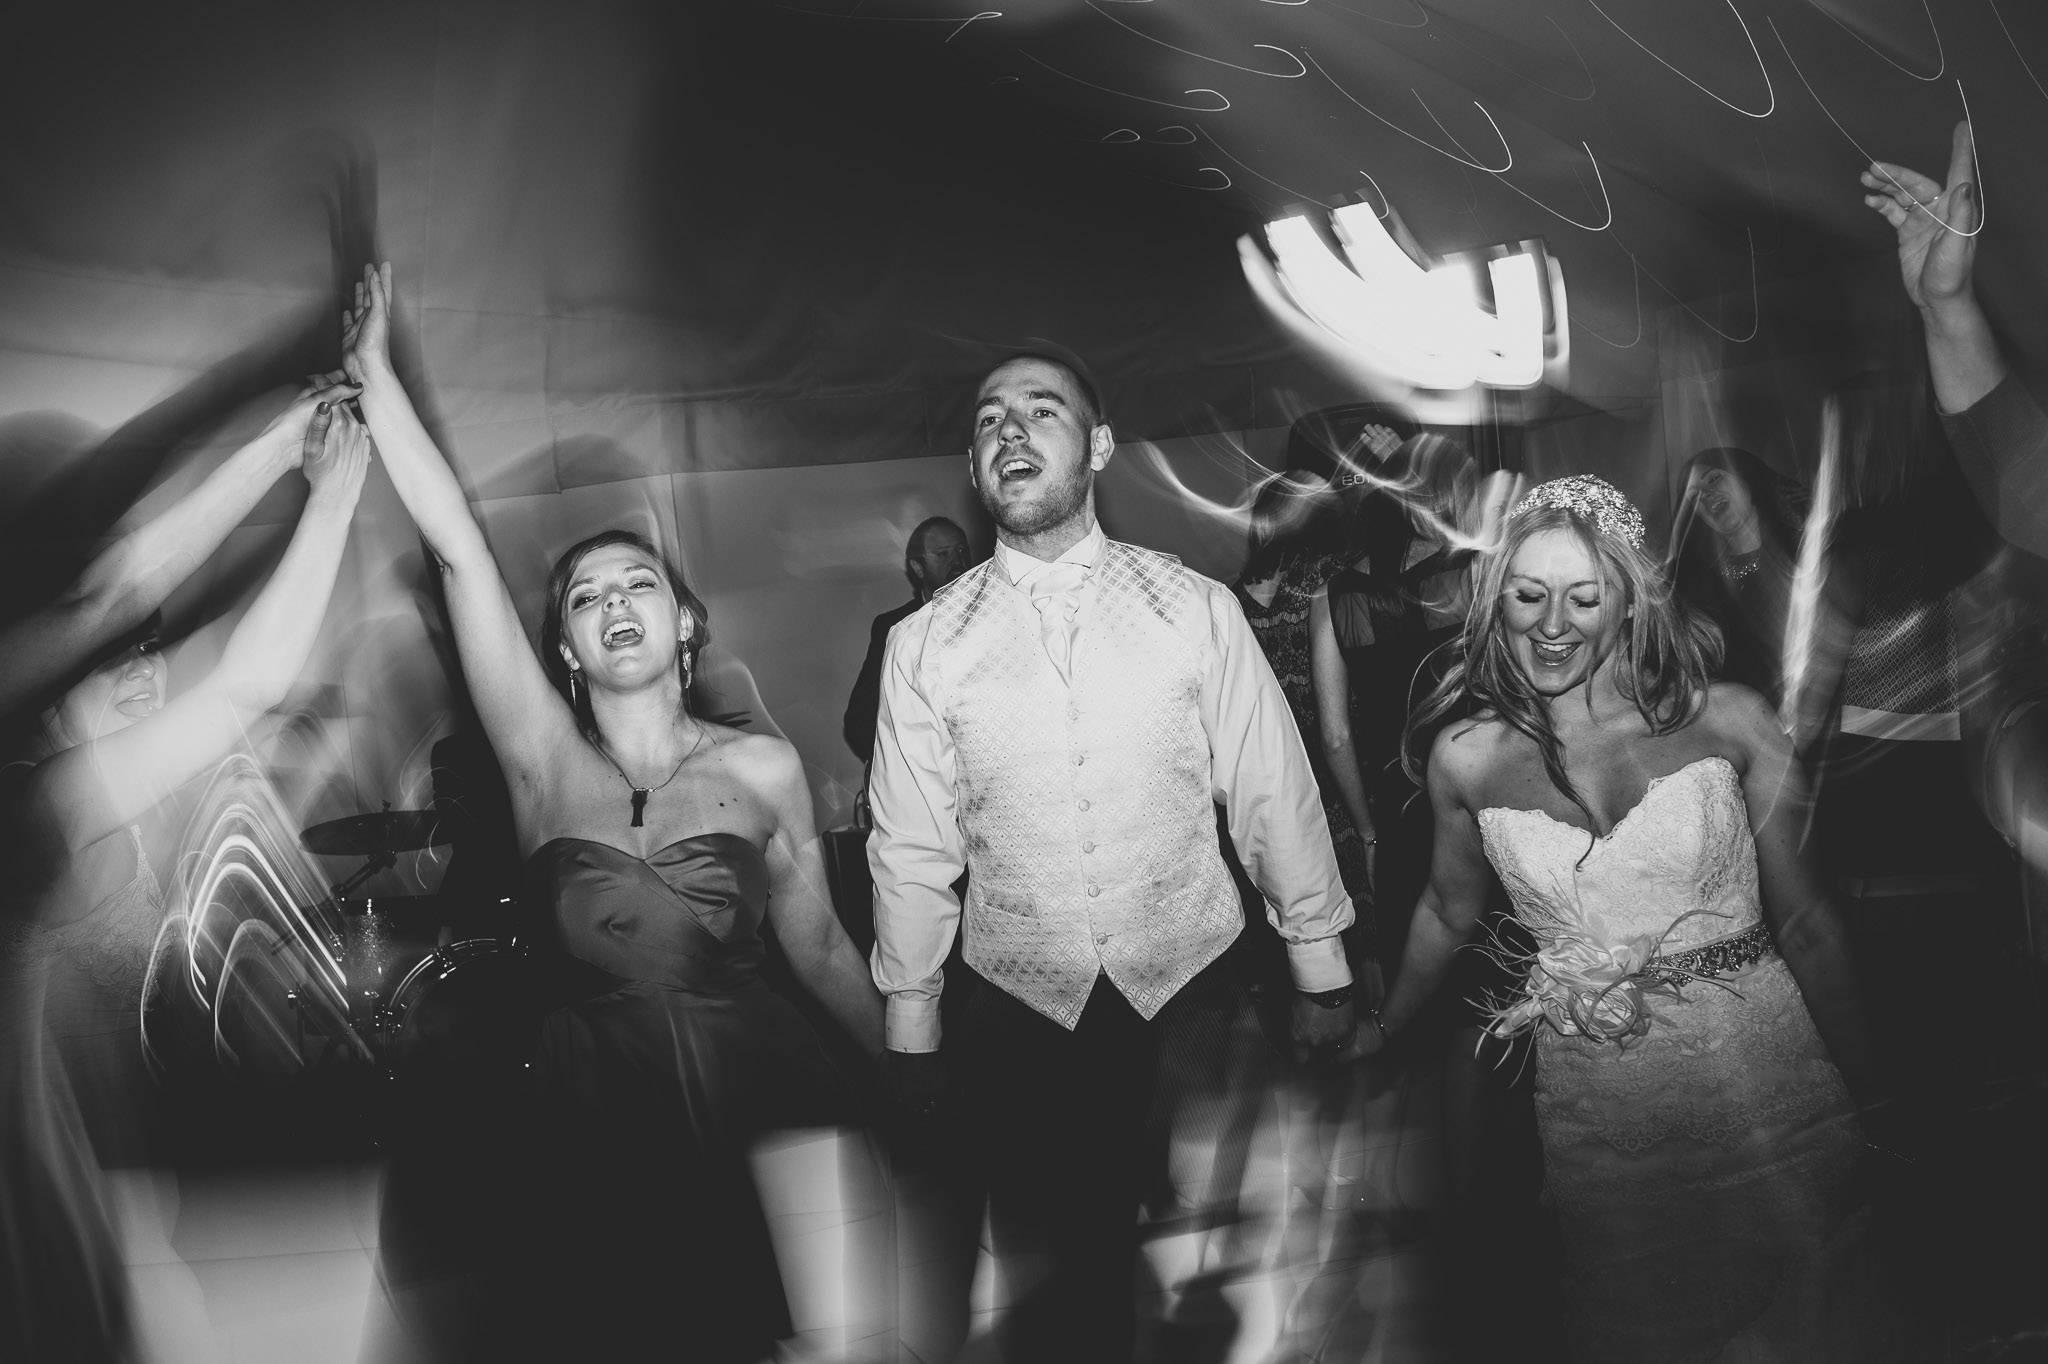 shropshire-wedding-photography 39.jpg